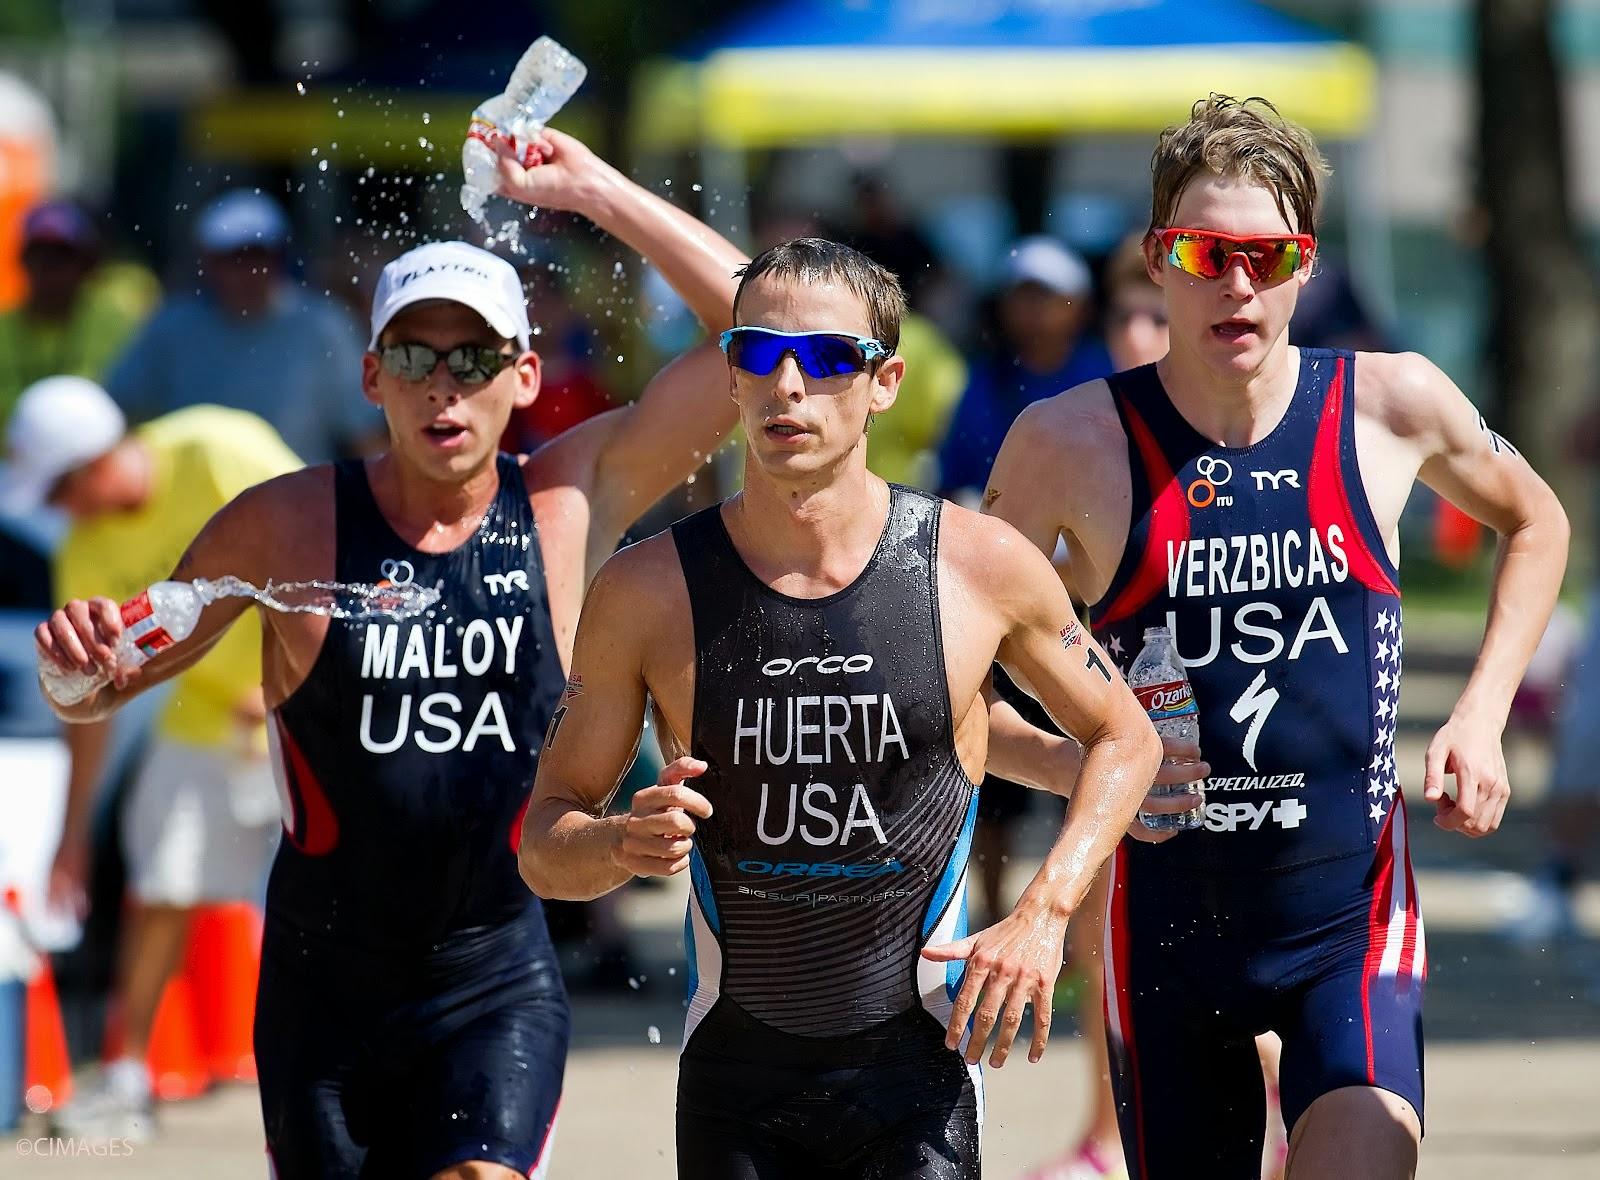 Male Athletes World: Triathlon: Korean national triathlete